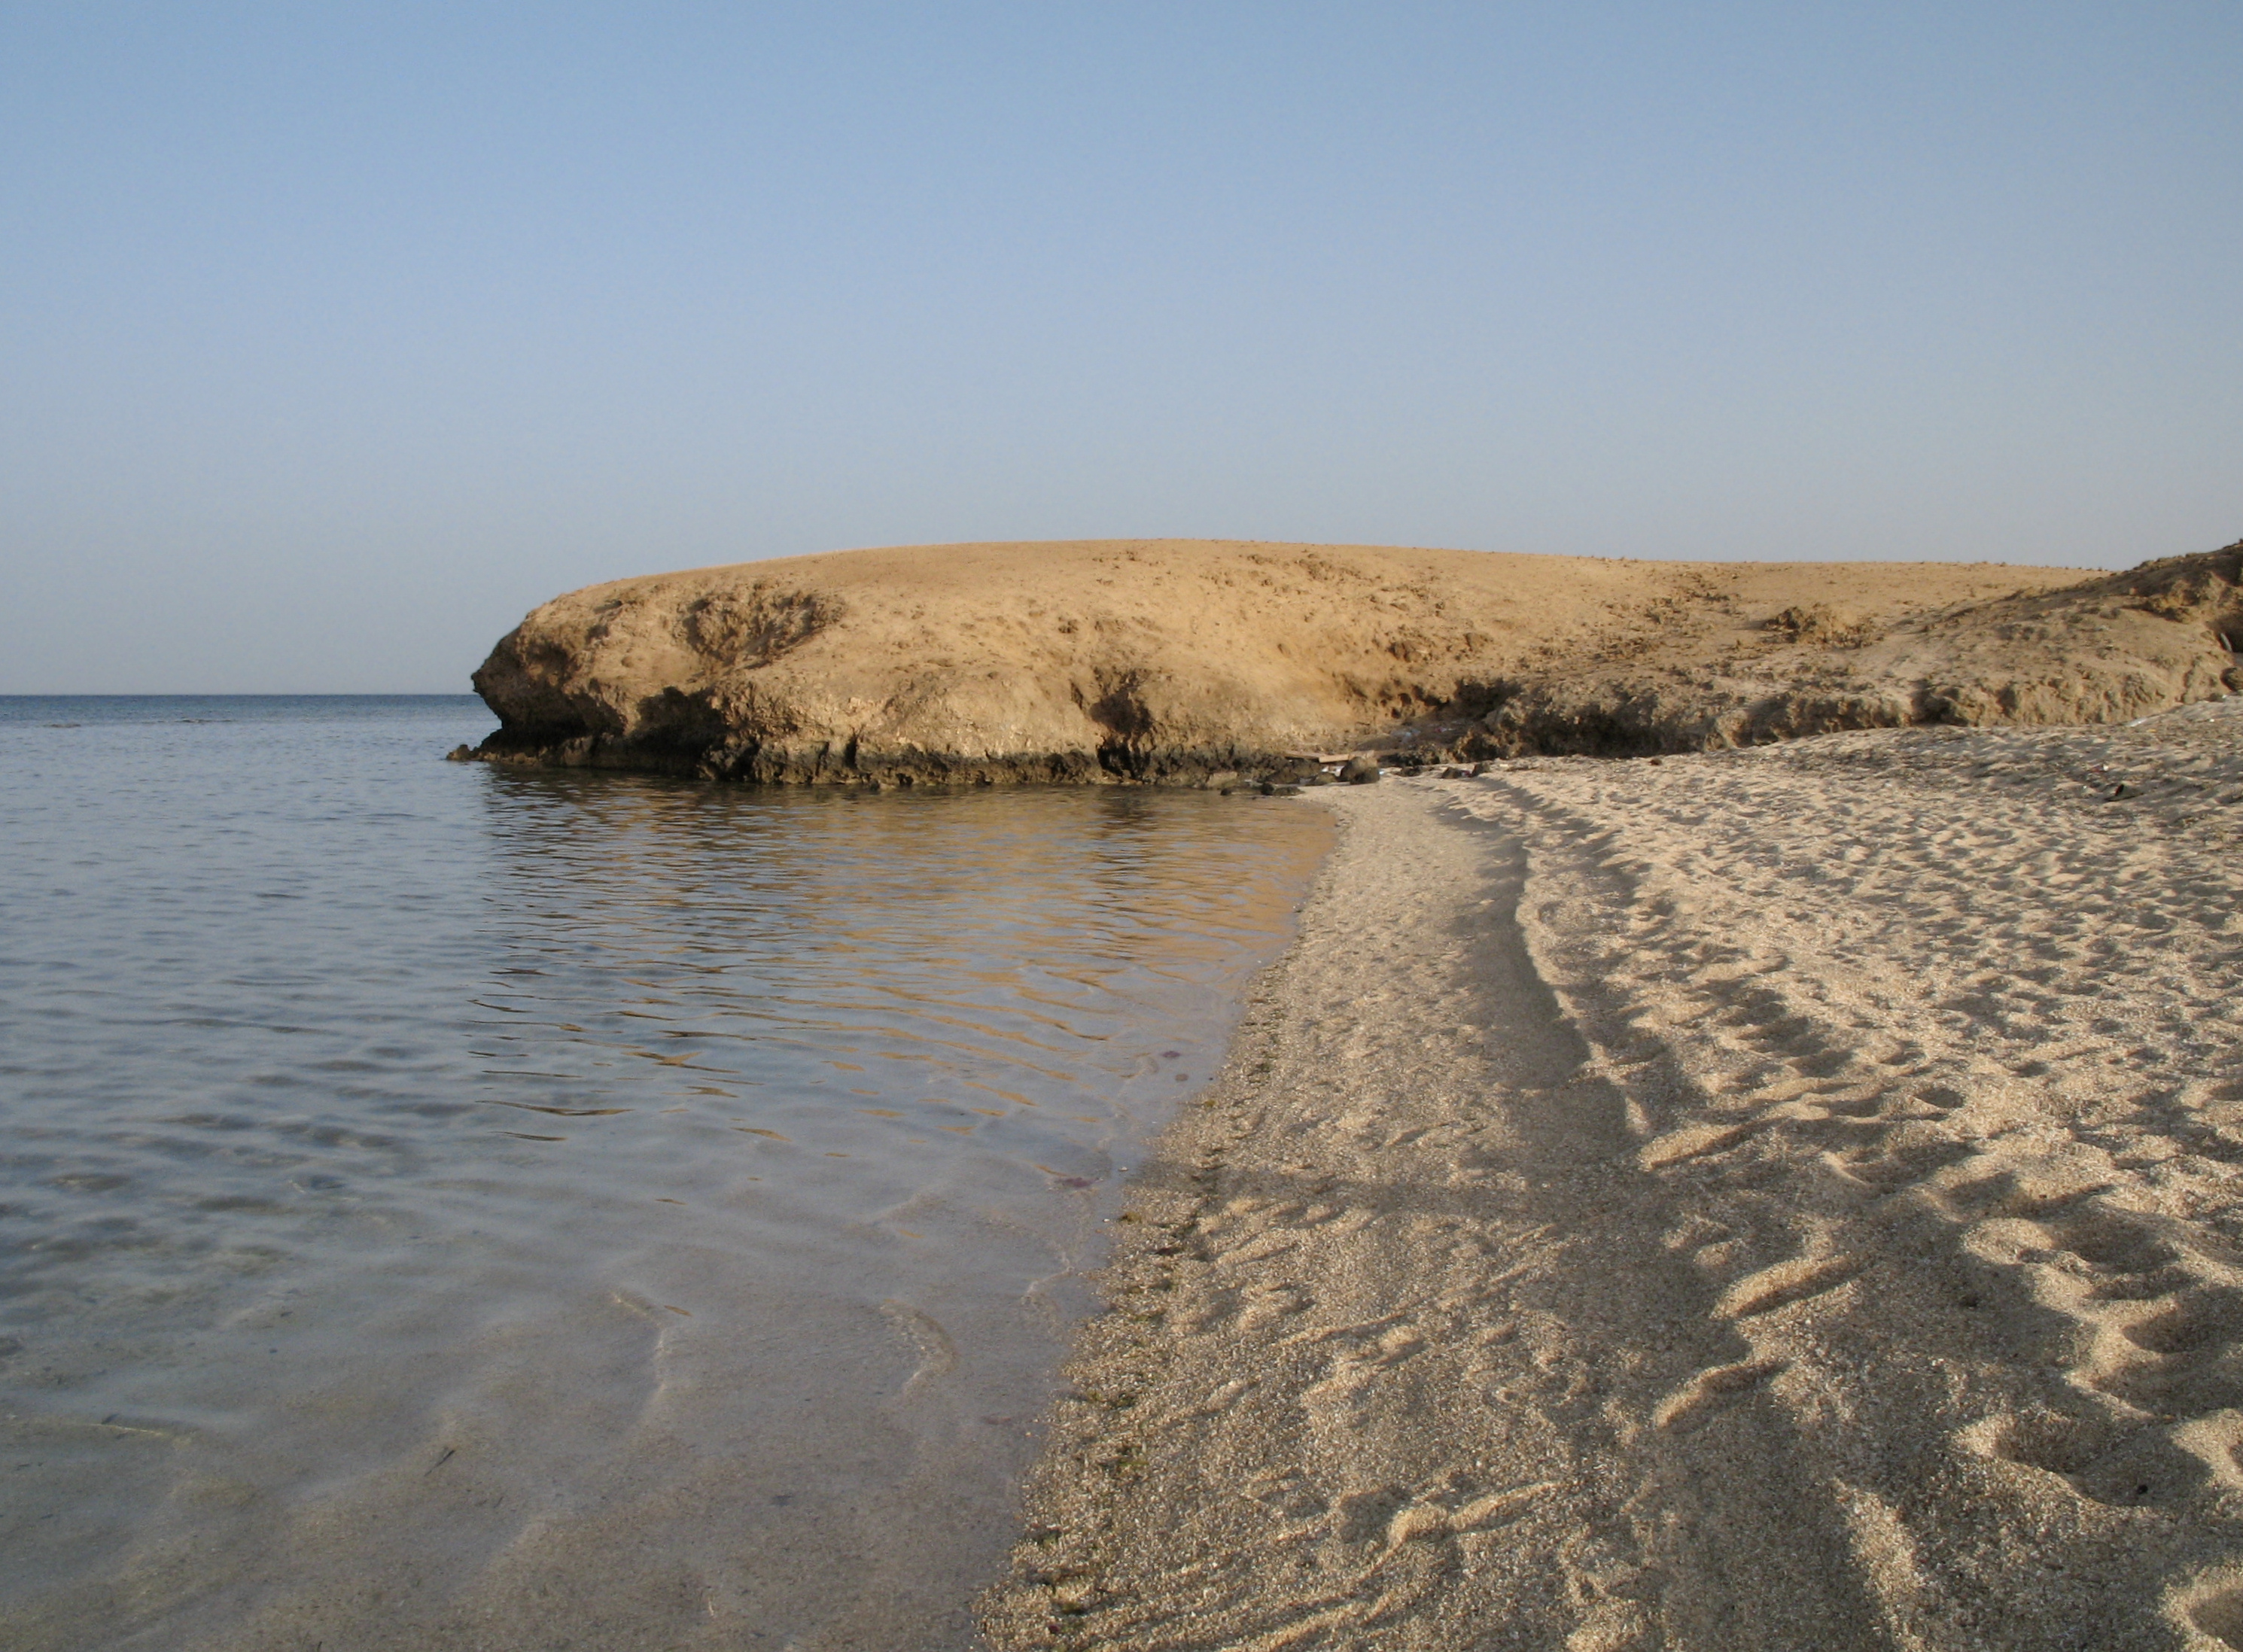 FileMarsa Alam Rjpg Wikimedia Commons - Map of egypt marsa alam